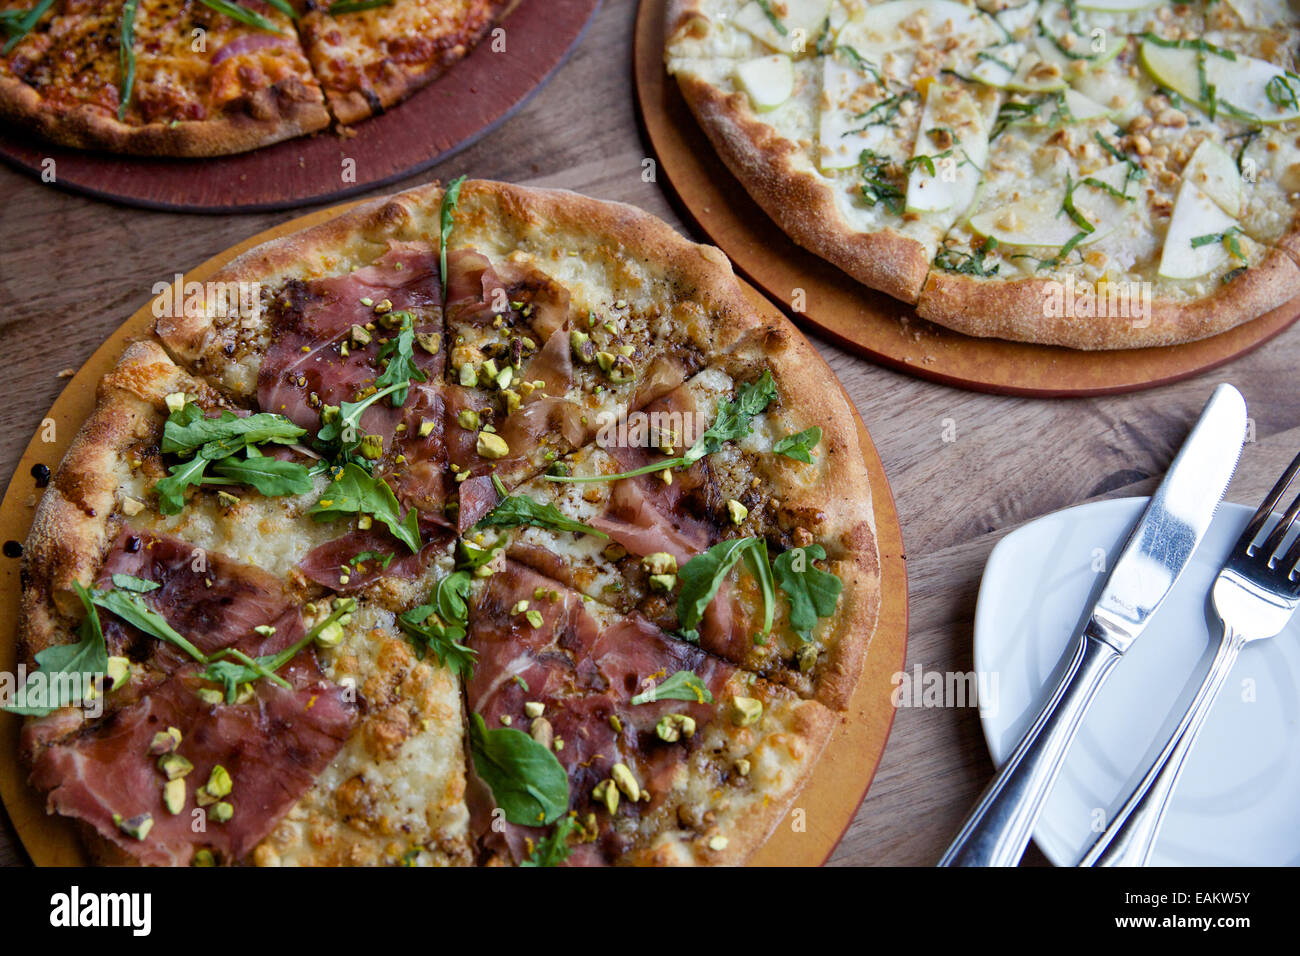 Gourmet Pizza in Missoula, Montana. (Foto di Bess Brownlee) Immagini Stock